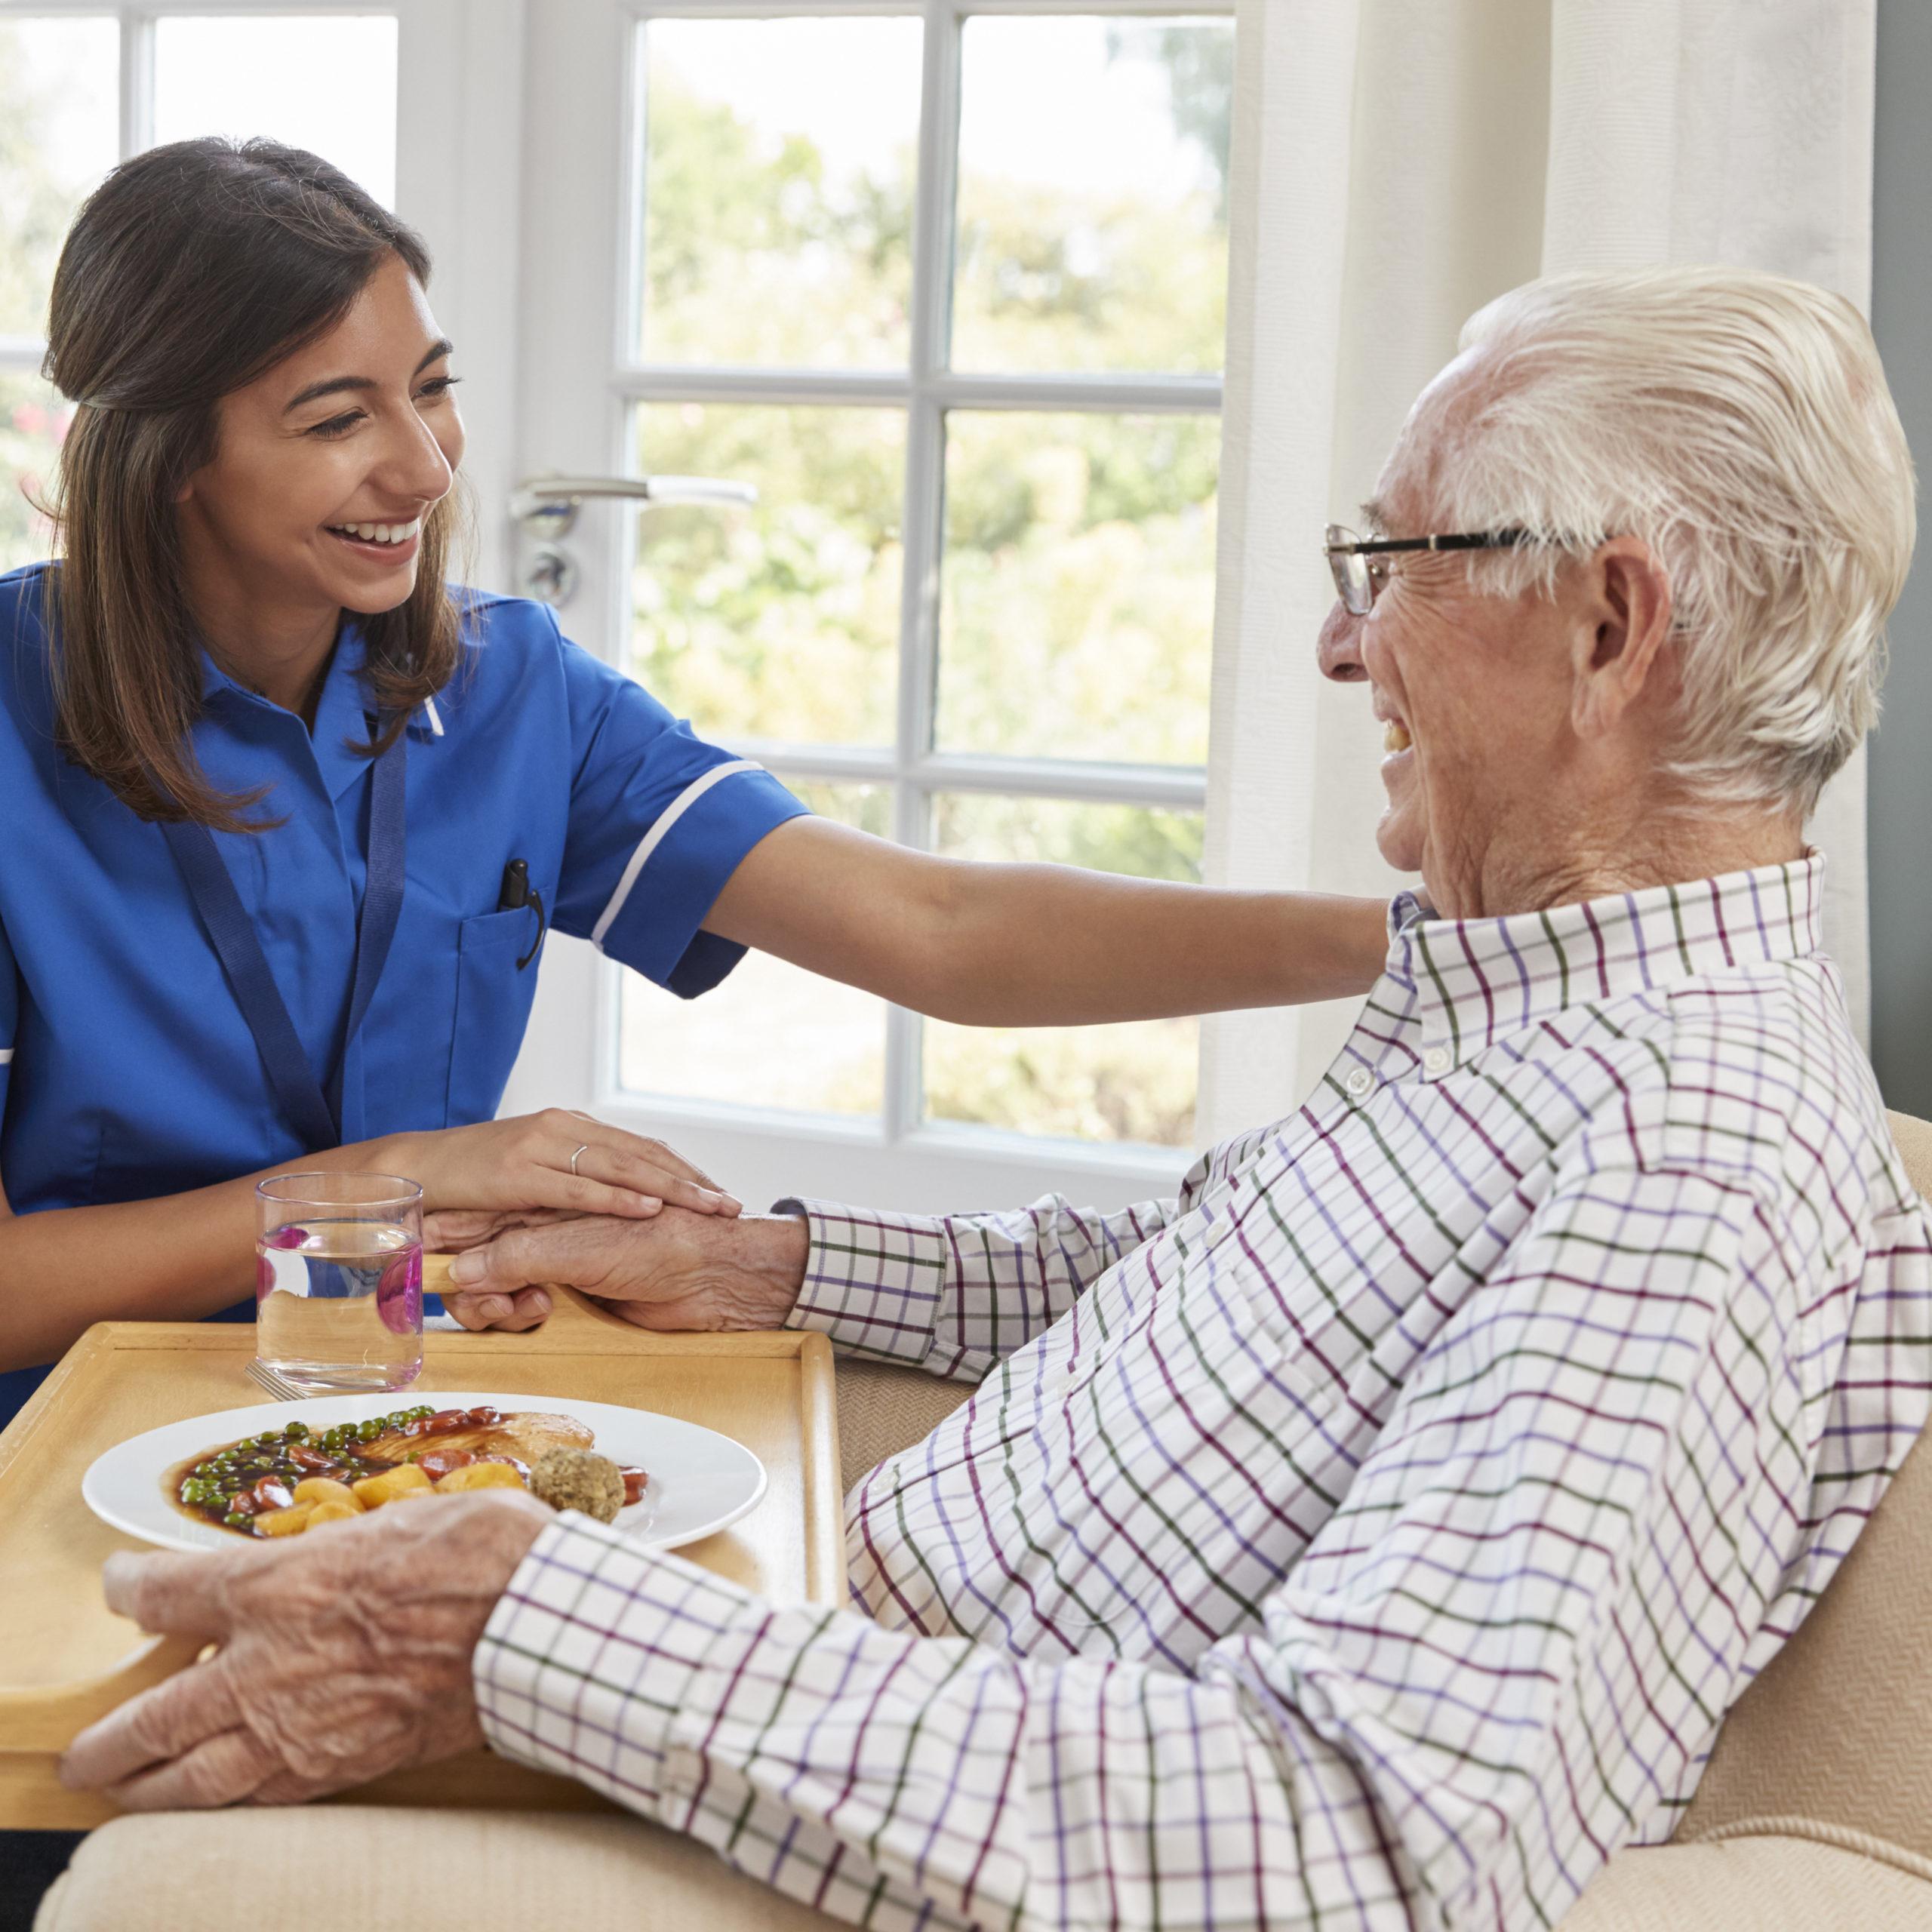 Nurse serving dinner to a senior man in an armchair at home